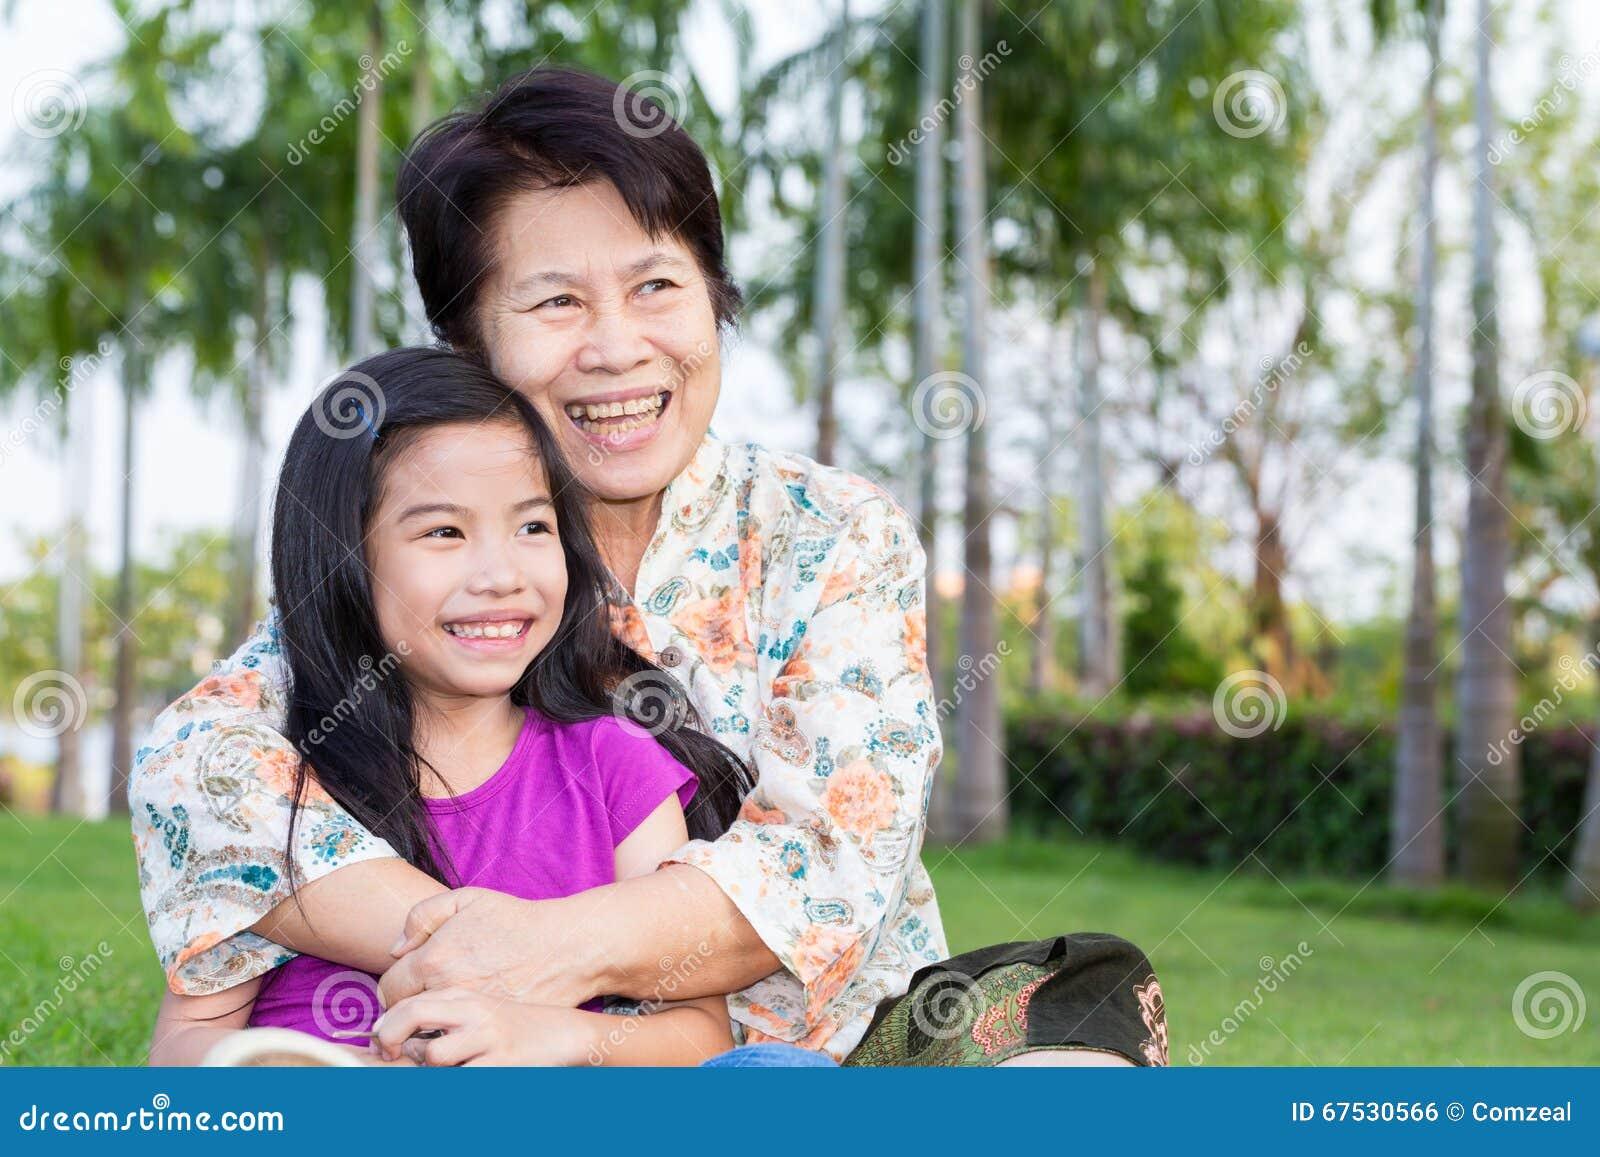 happy asian grandma and grandchild smiling stock photo image of